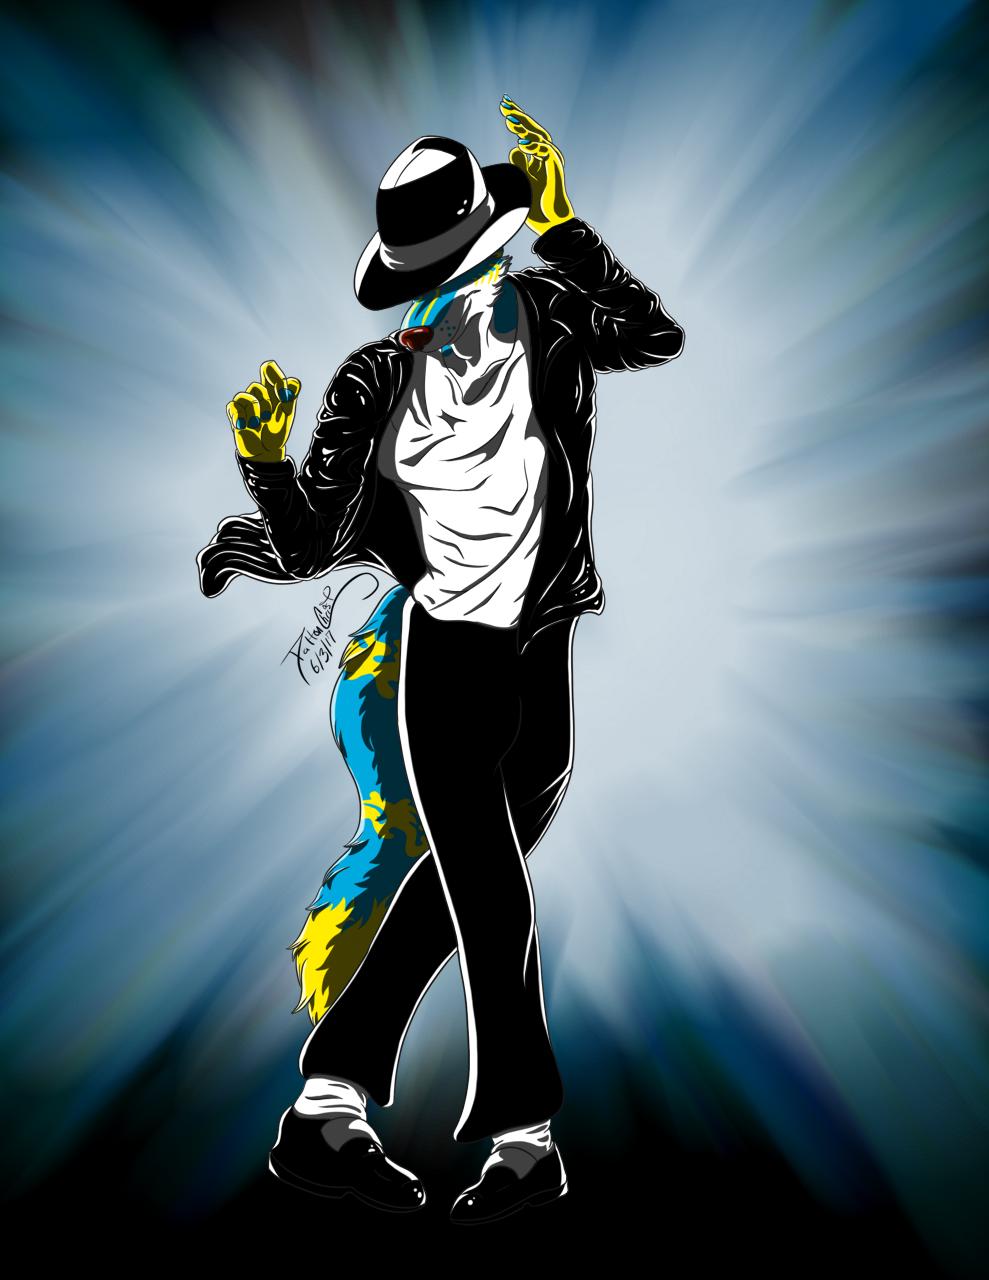 A Tribute to a Legend : Michael Jackson (2017)